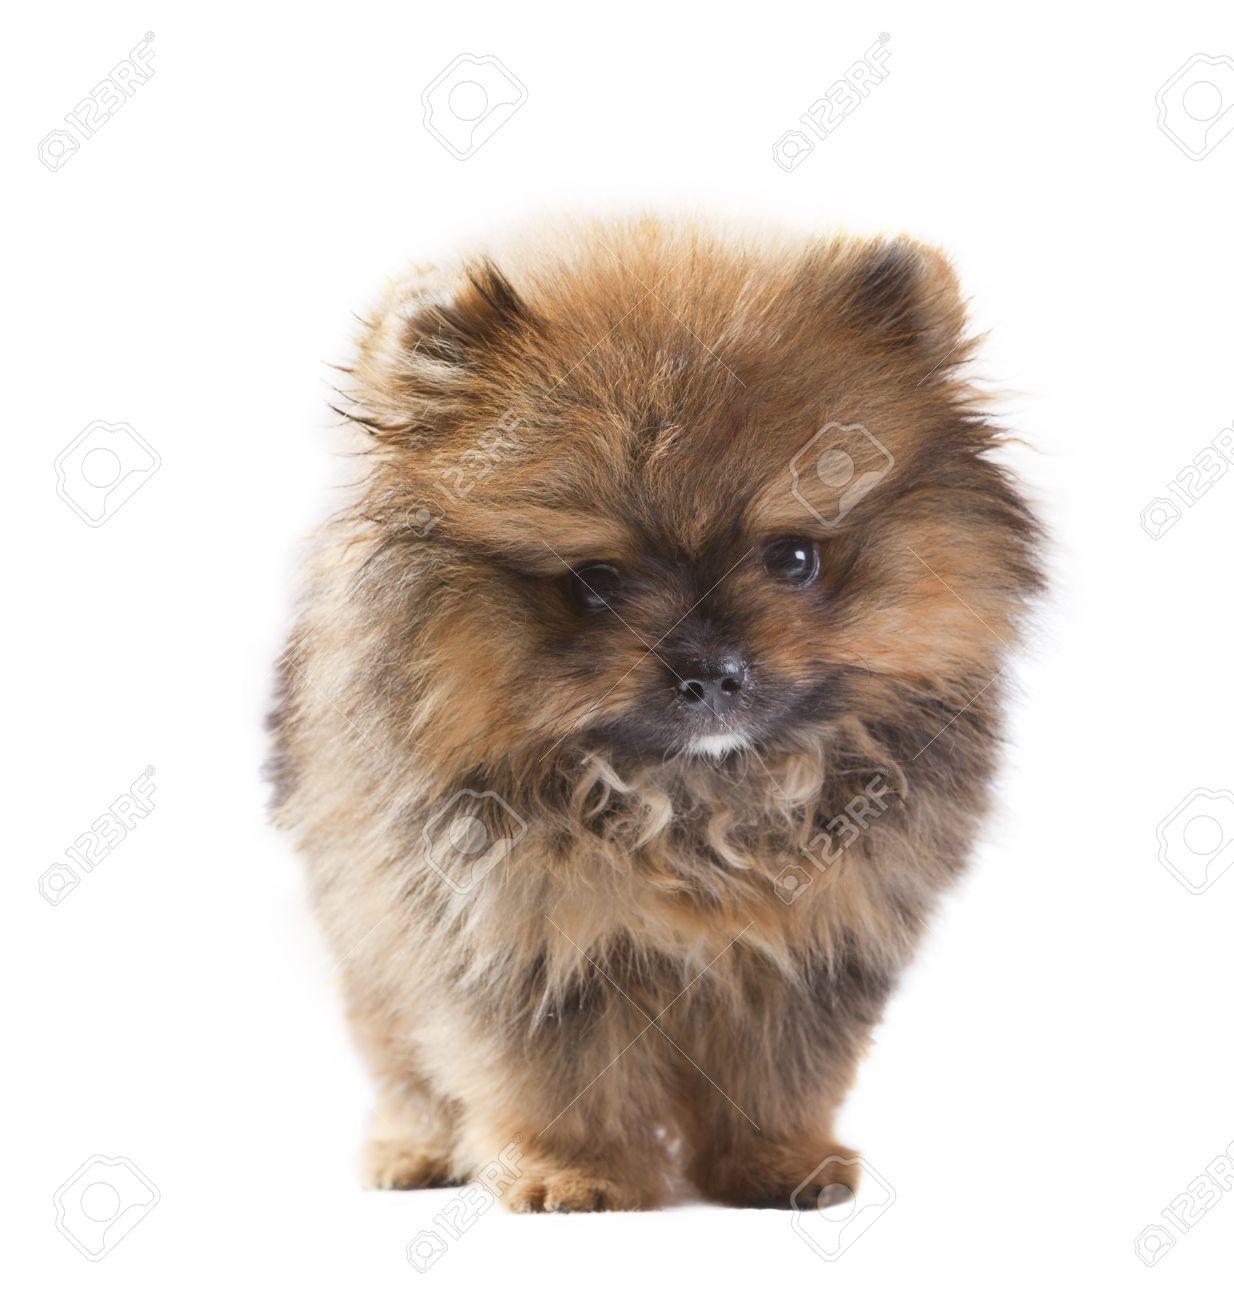 Baby Of Pomeranian Dog Isolated White In Studio Pack Shot Stock